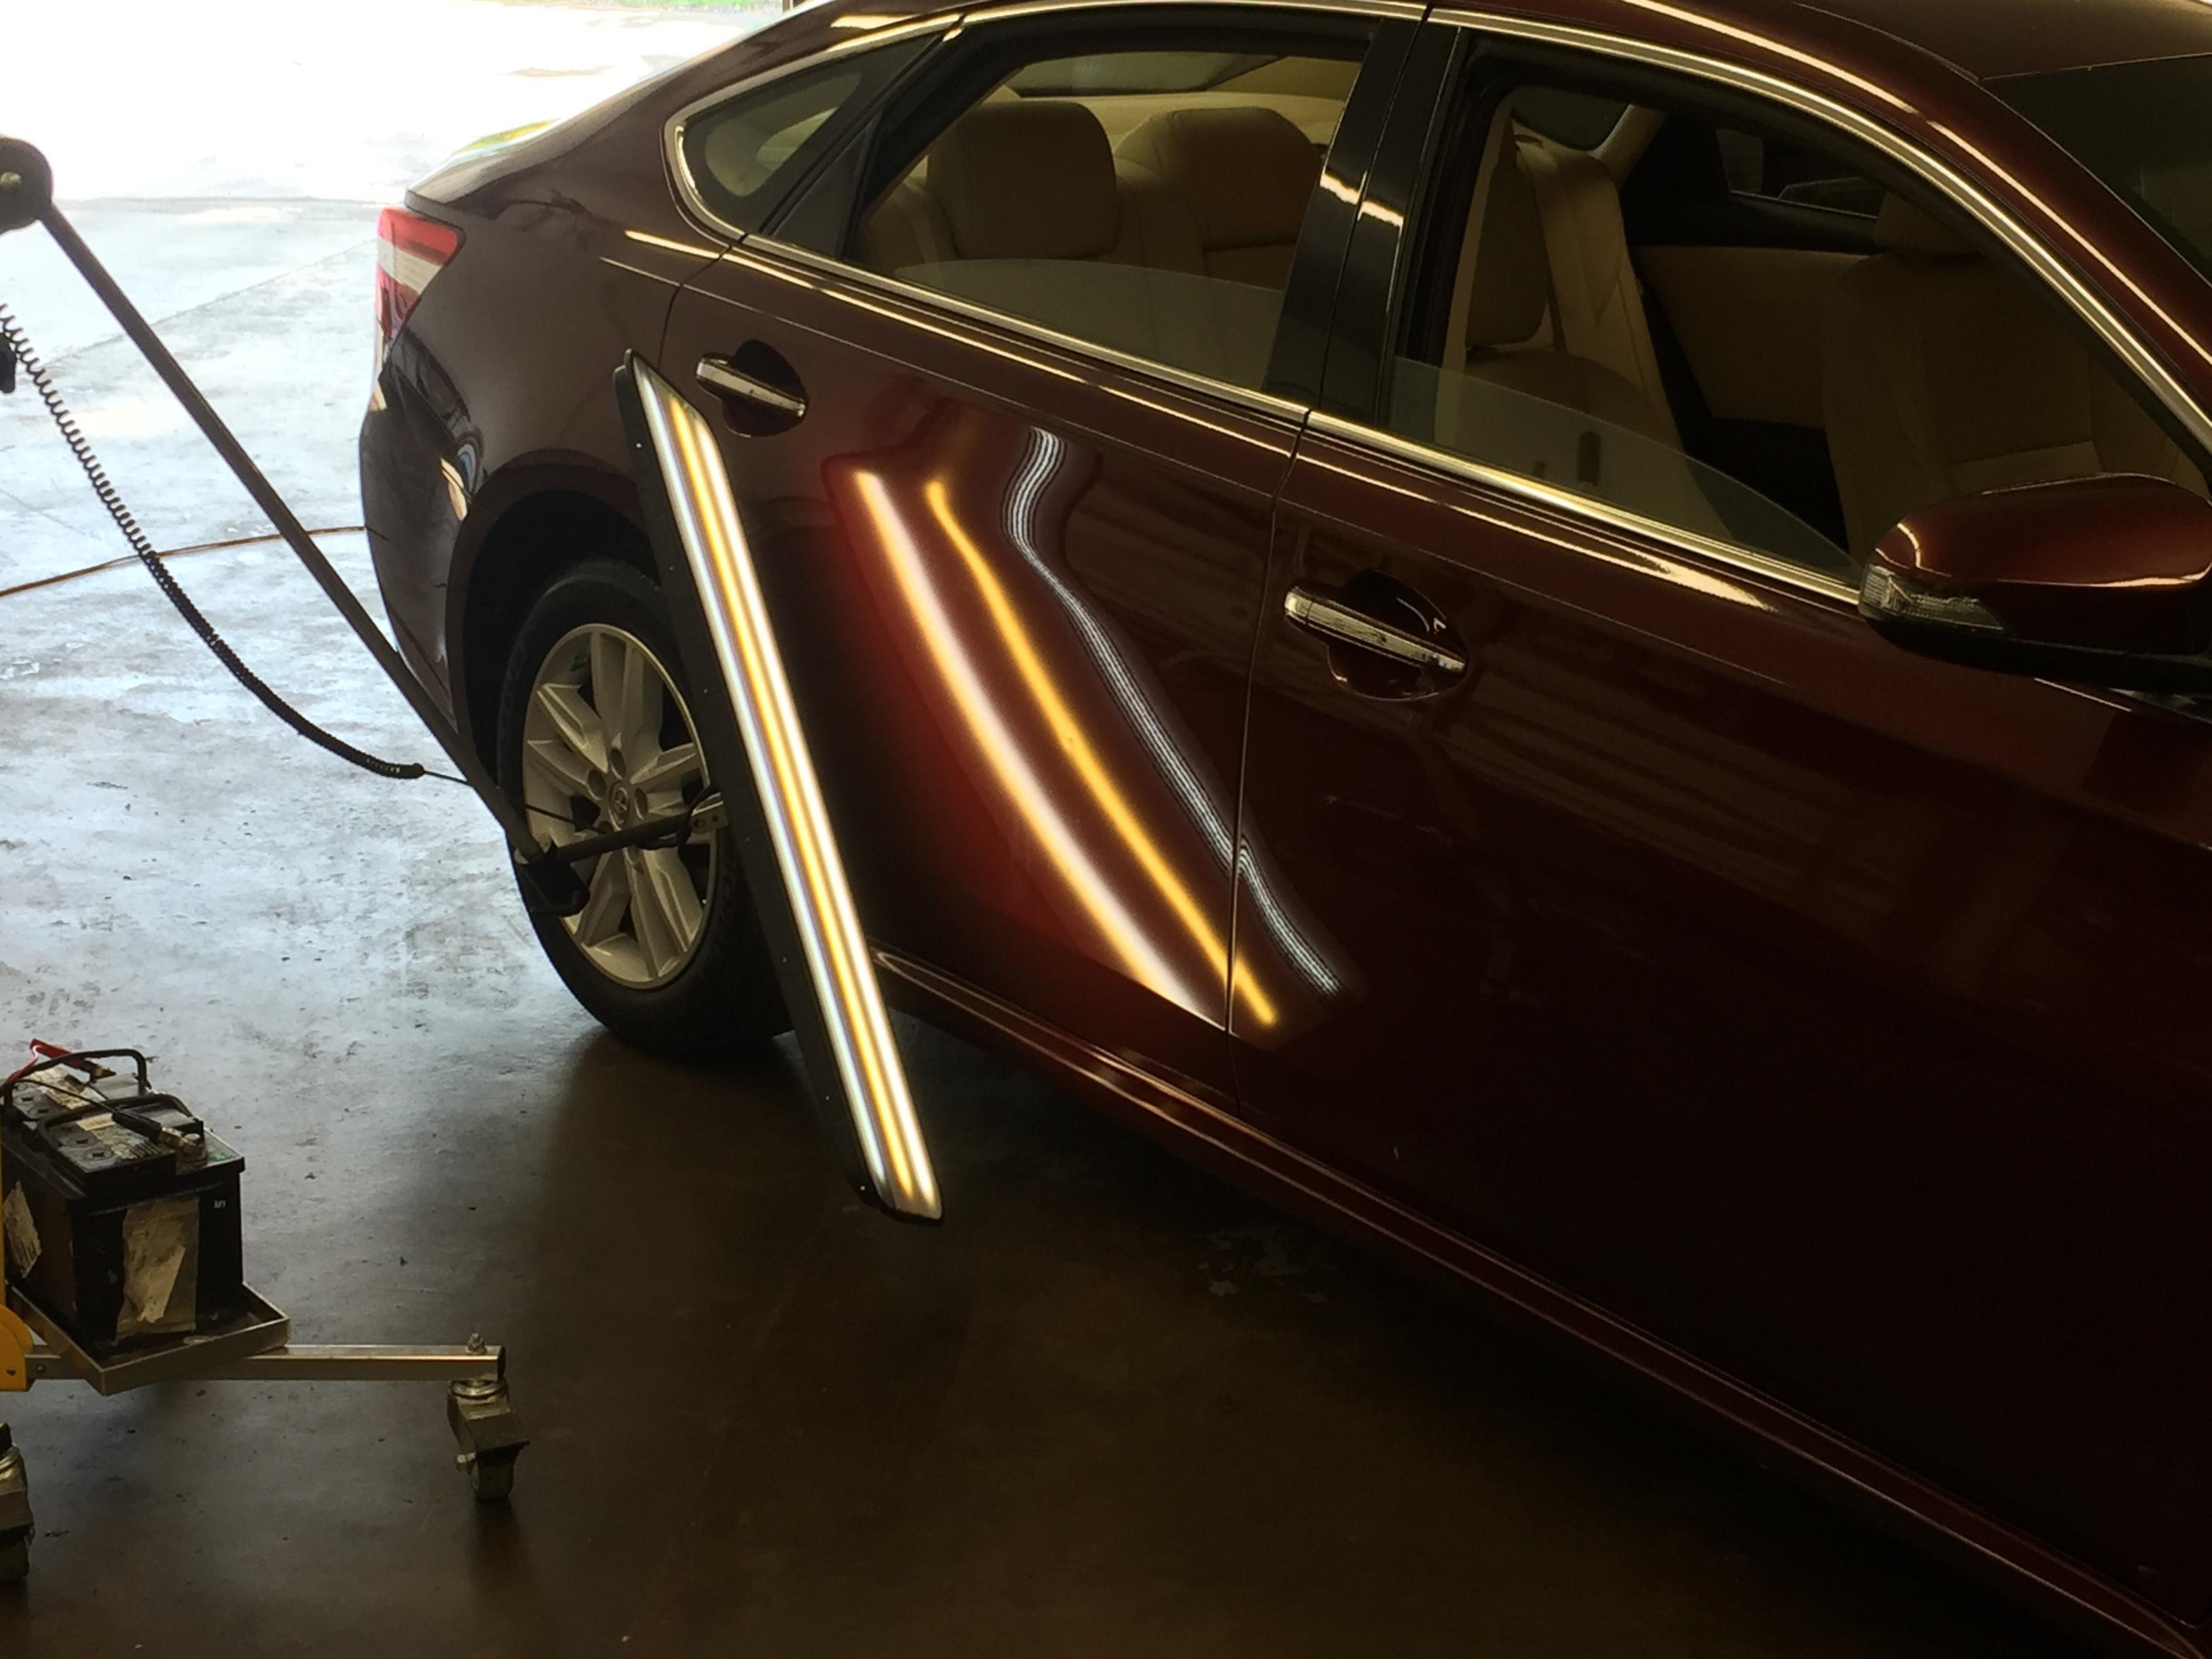 2013 Toyota Avalon Paintless Dent Removal, passenger rear door dent removal, http://217dent.com